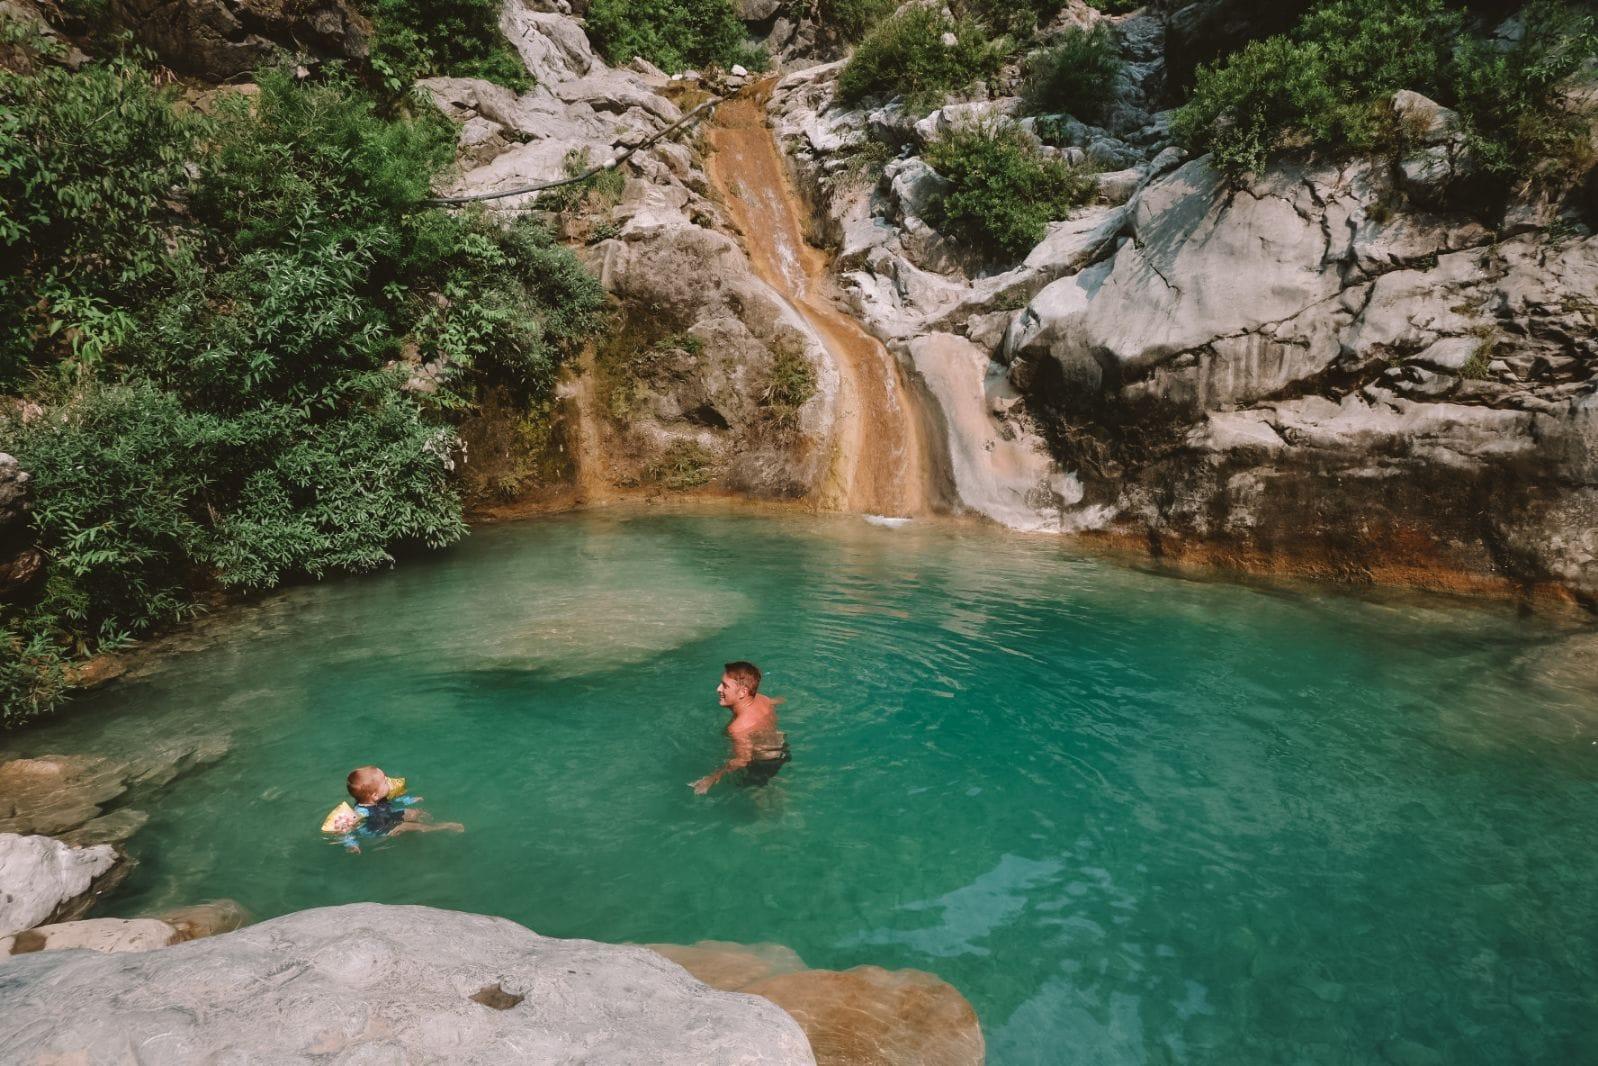 Shumber waterfall, Pakistan | My Passport Abroad